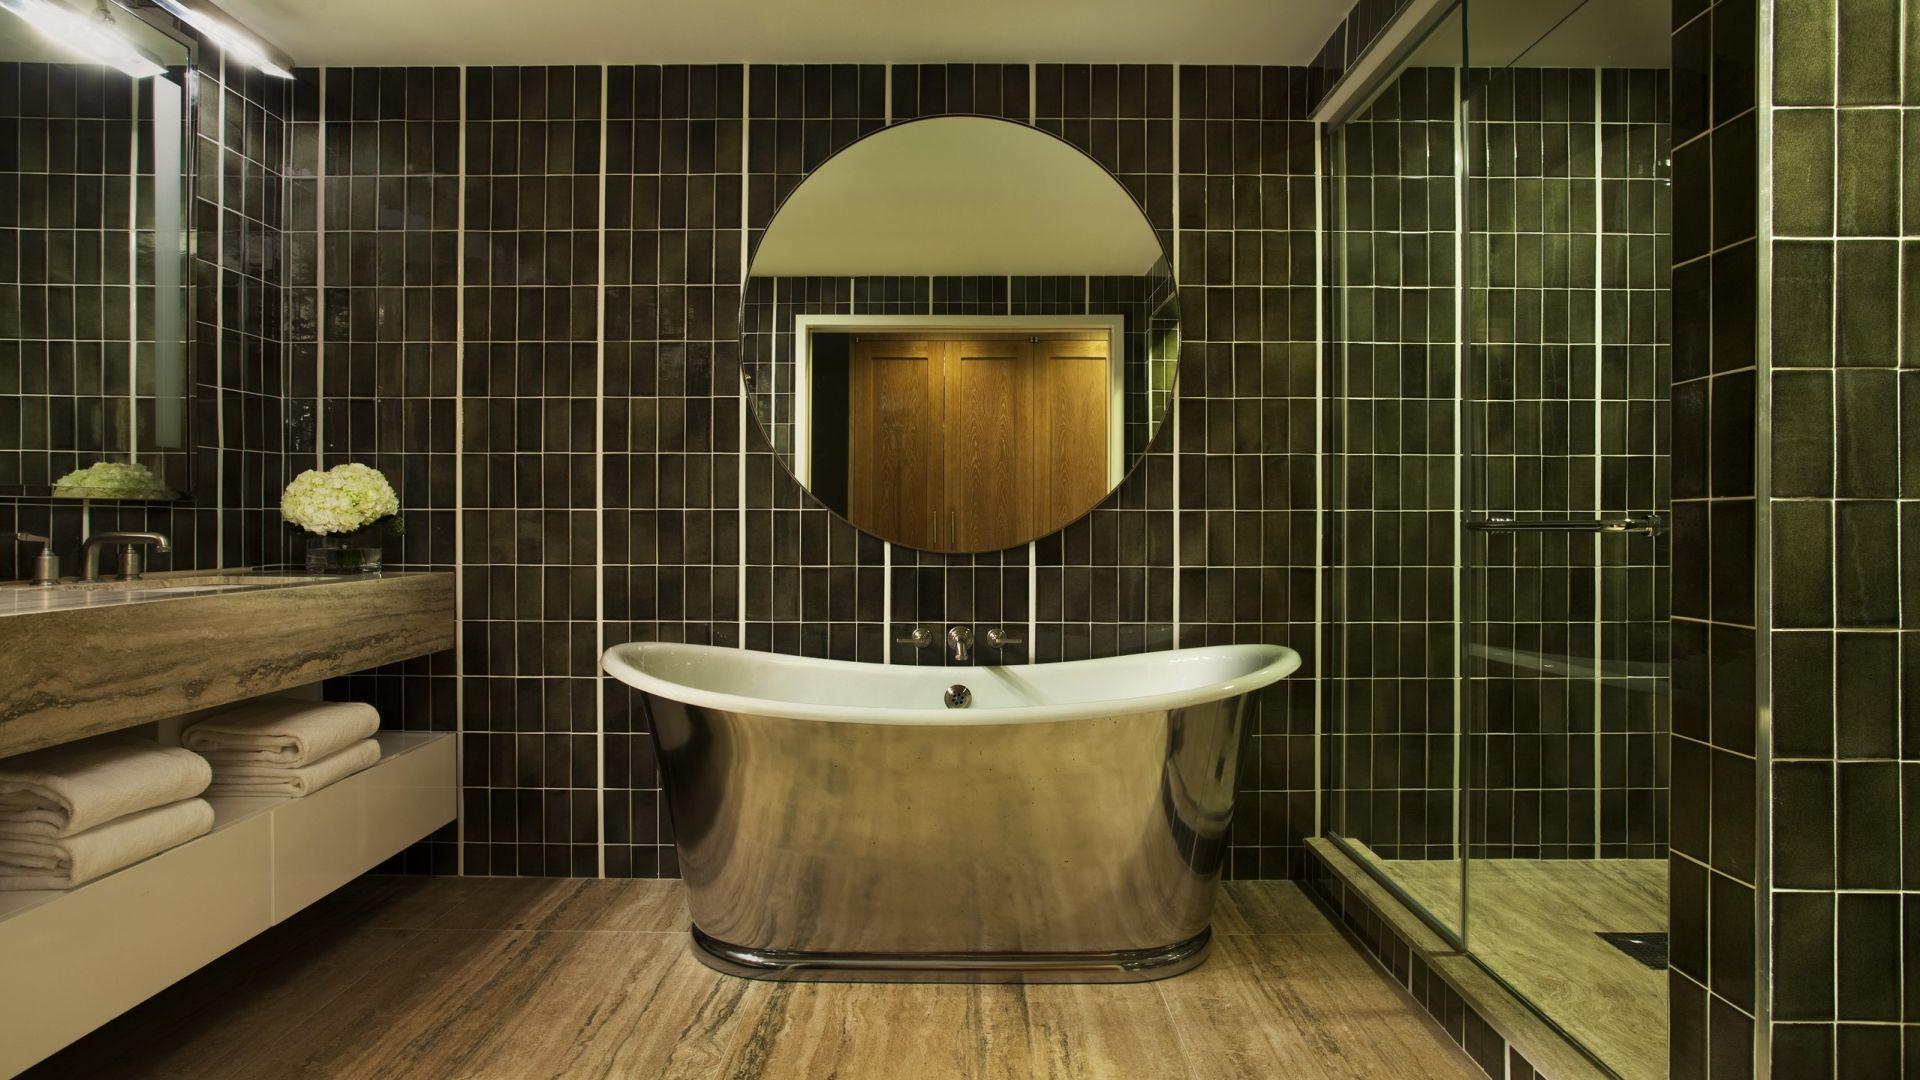 Banheiro da suíte exclusiva Uptown Bohemian | Loews Regency New York Hotel